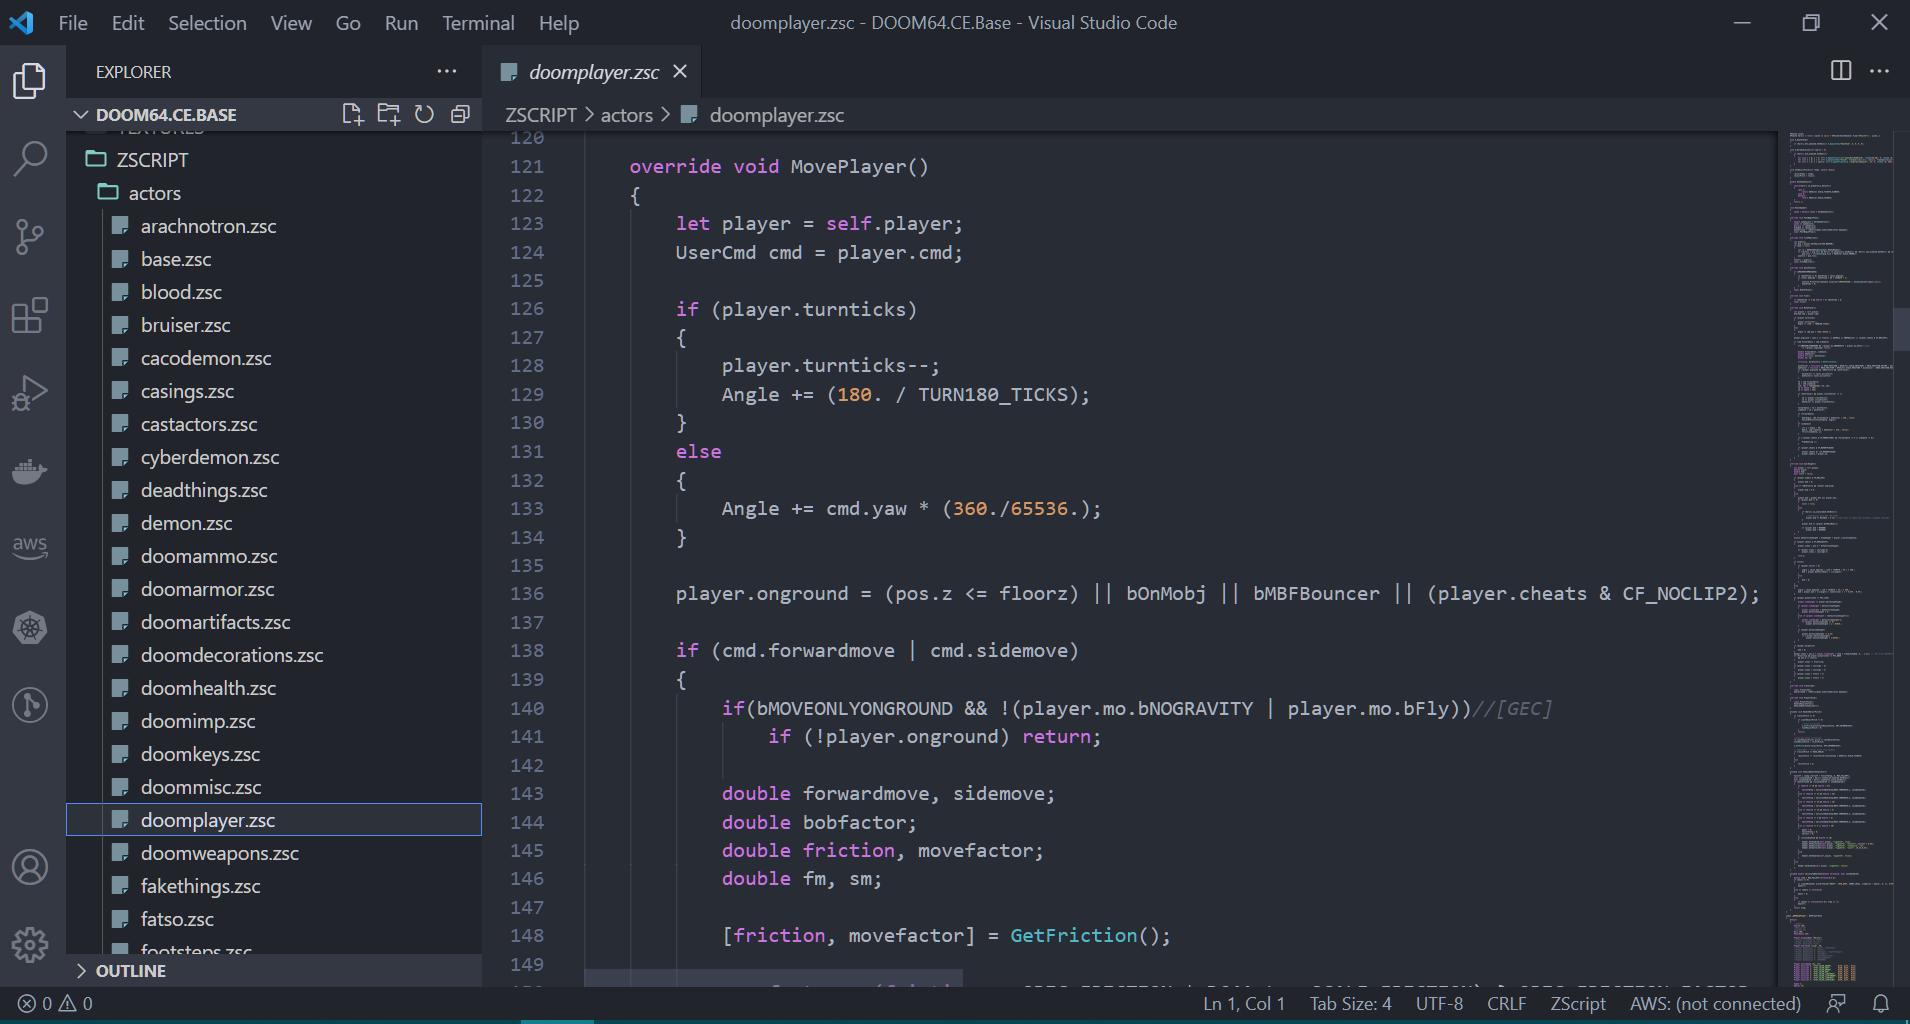 Version 2.0.0 features a major code rewrite.